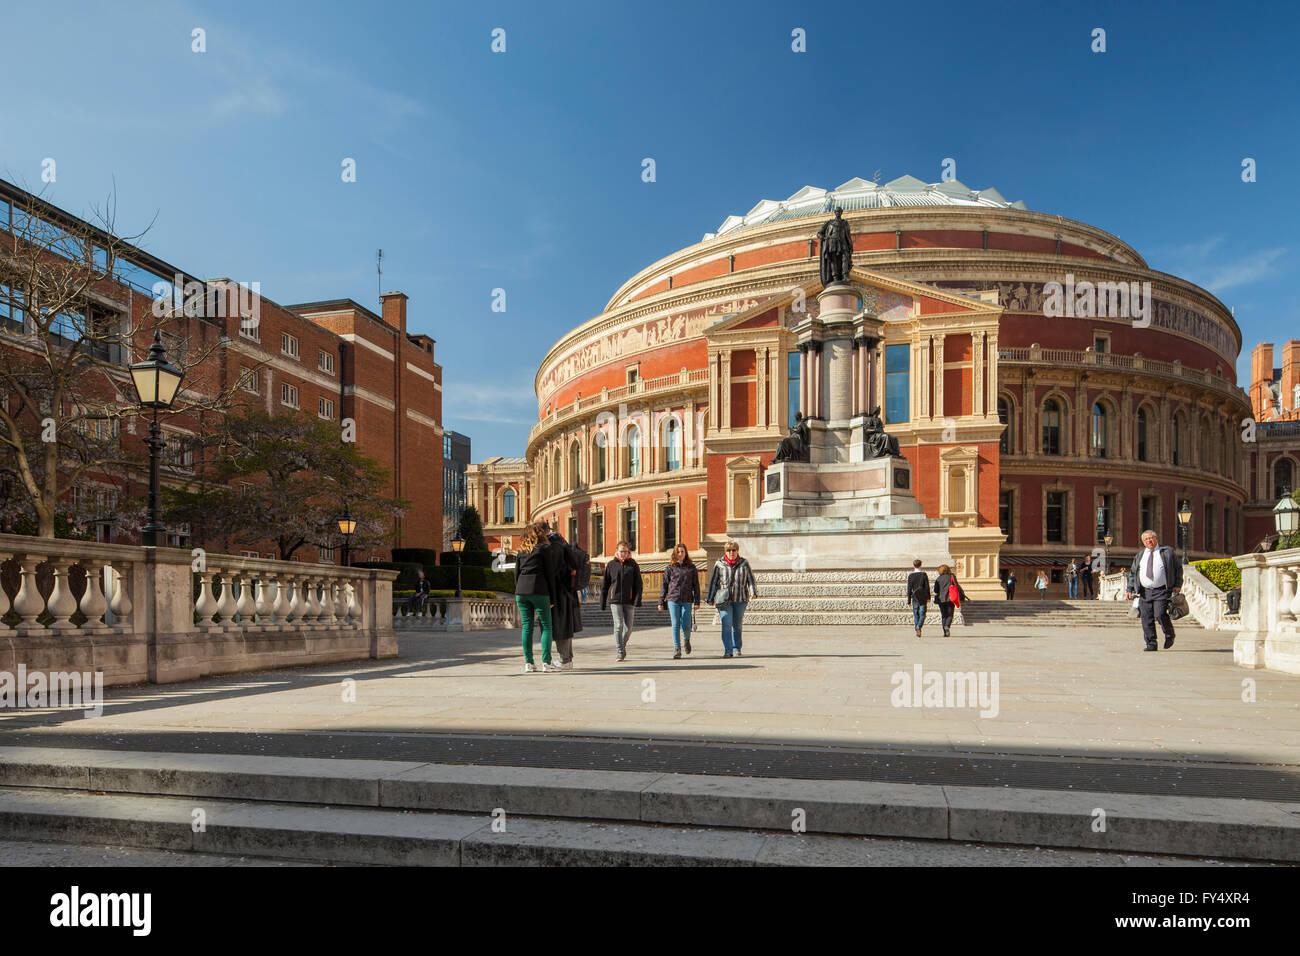 Albert Hall, de Kensington, Londres, Angleterre. Photo Stock